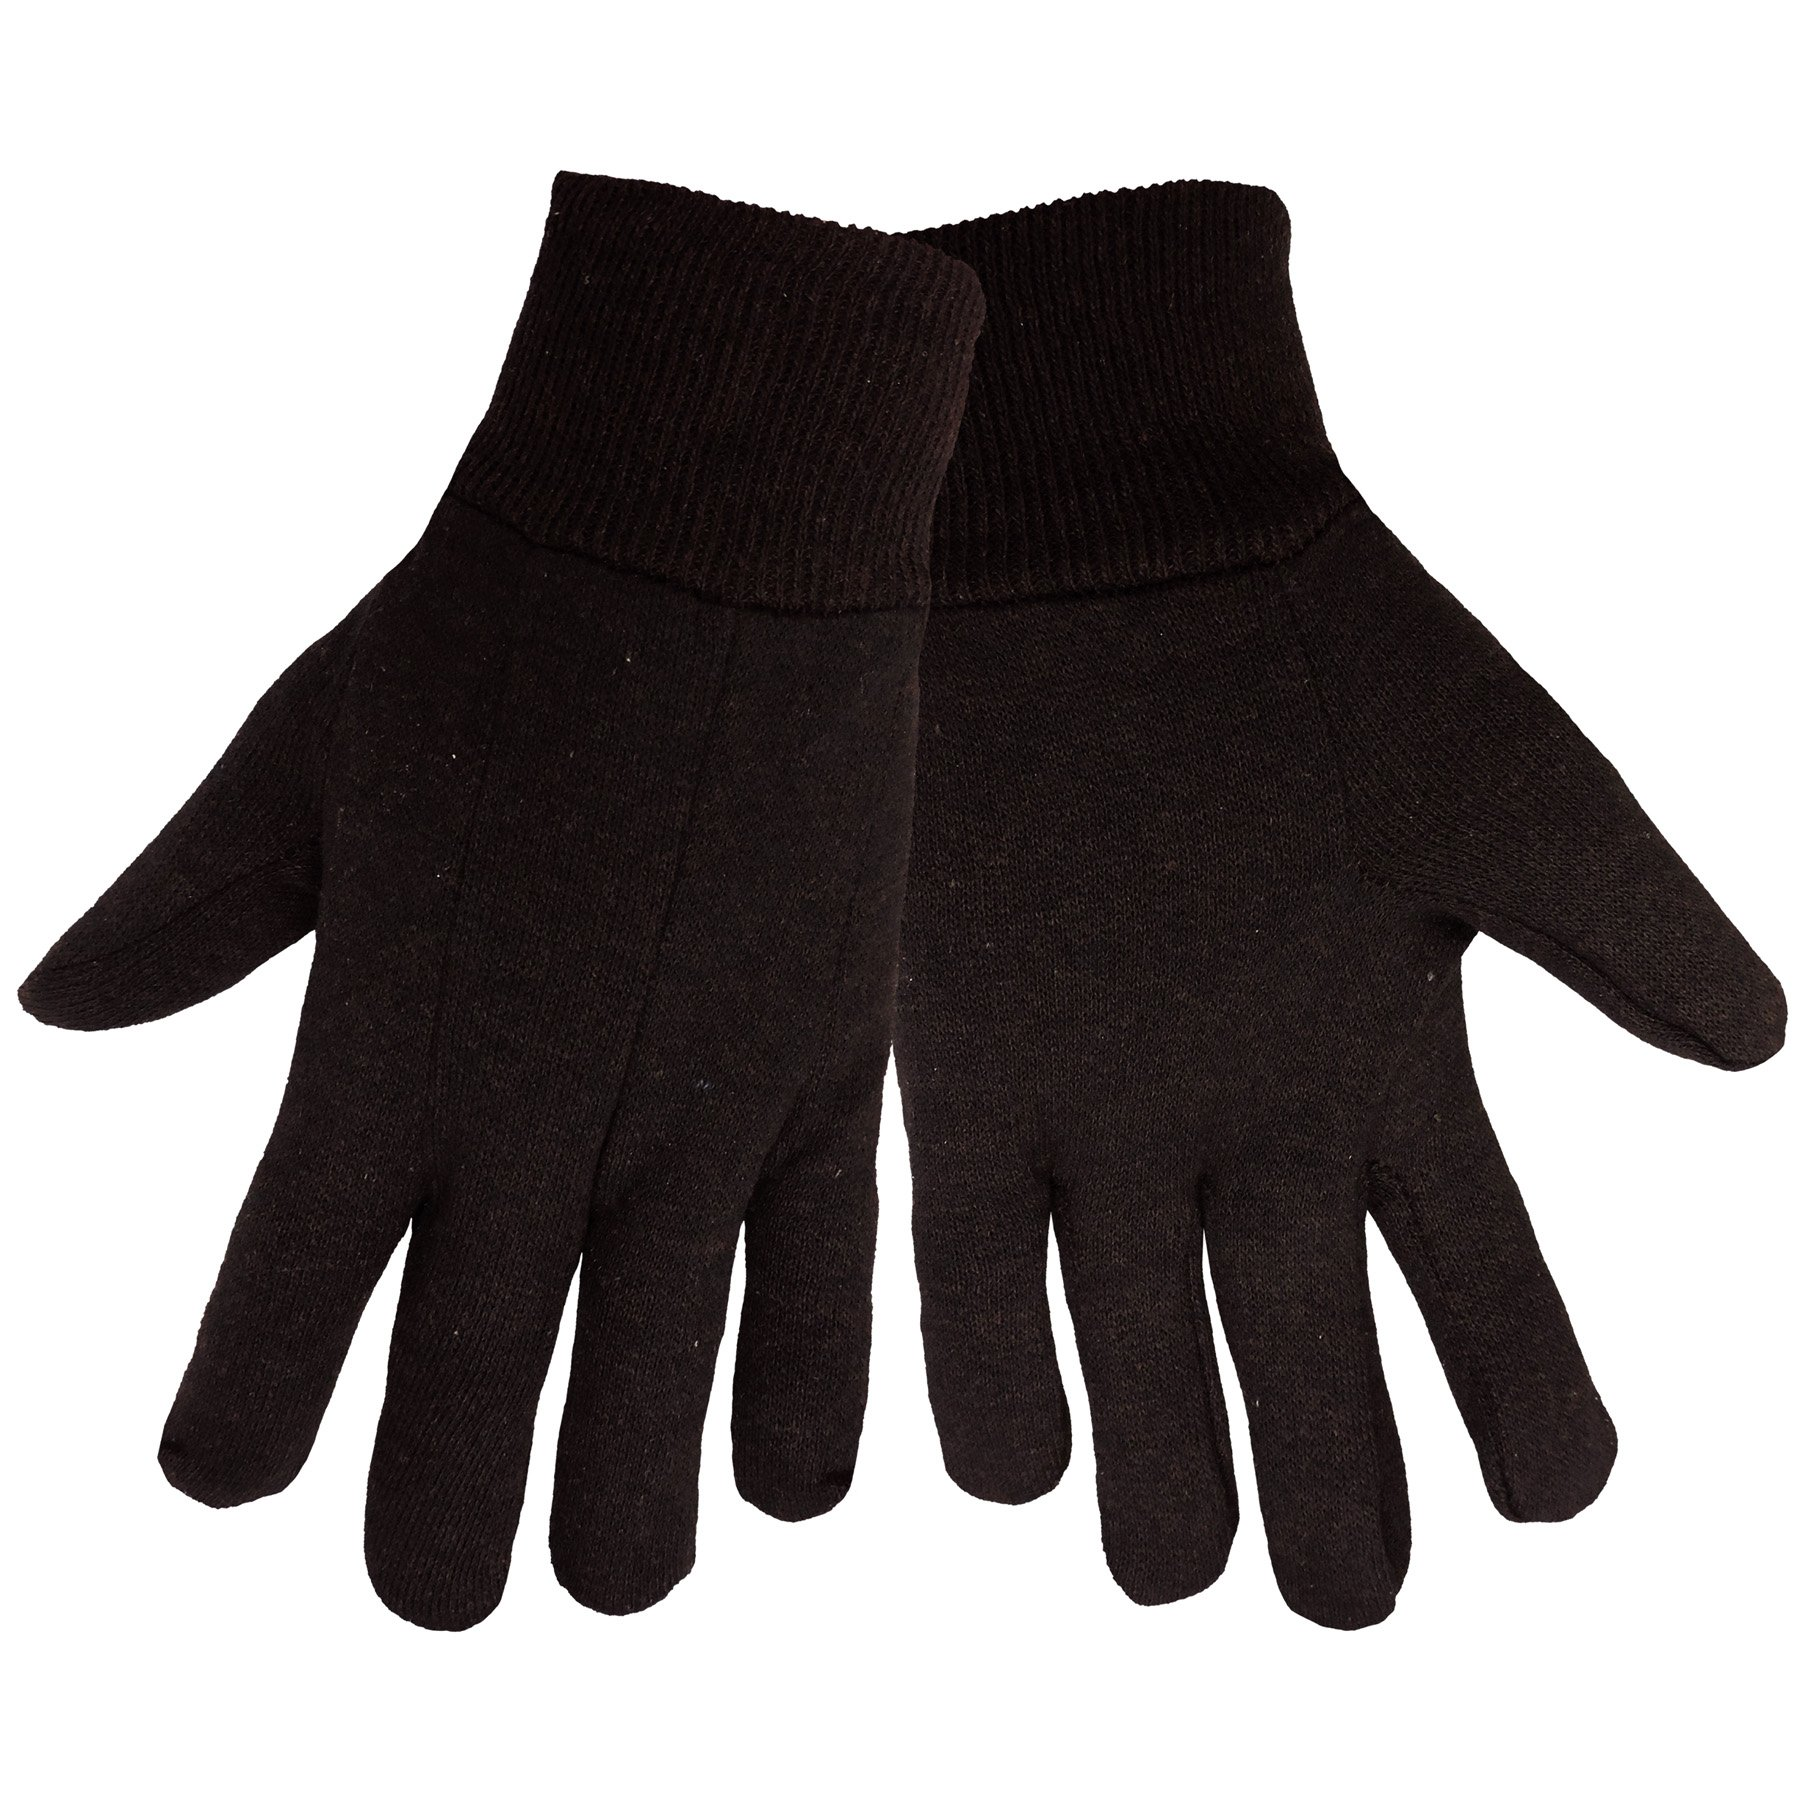 Global Glove C90BJ Cotton Jersey Glove, Work, Mens, Brown (Case of 300)